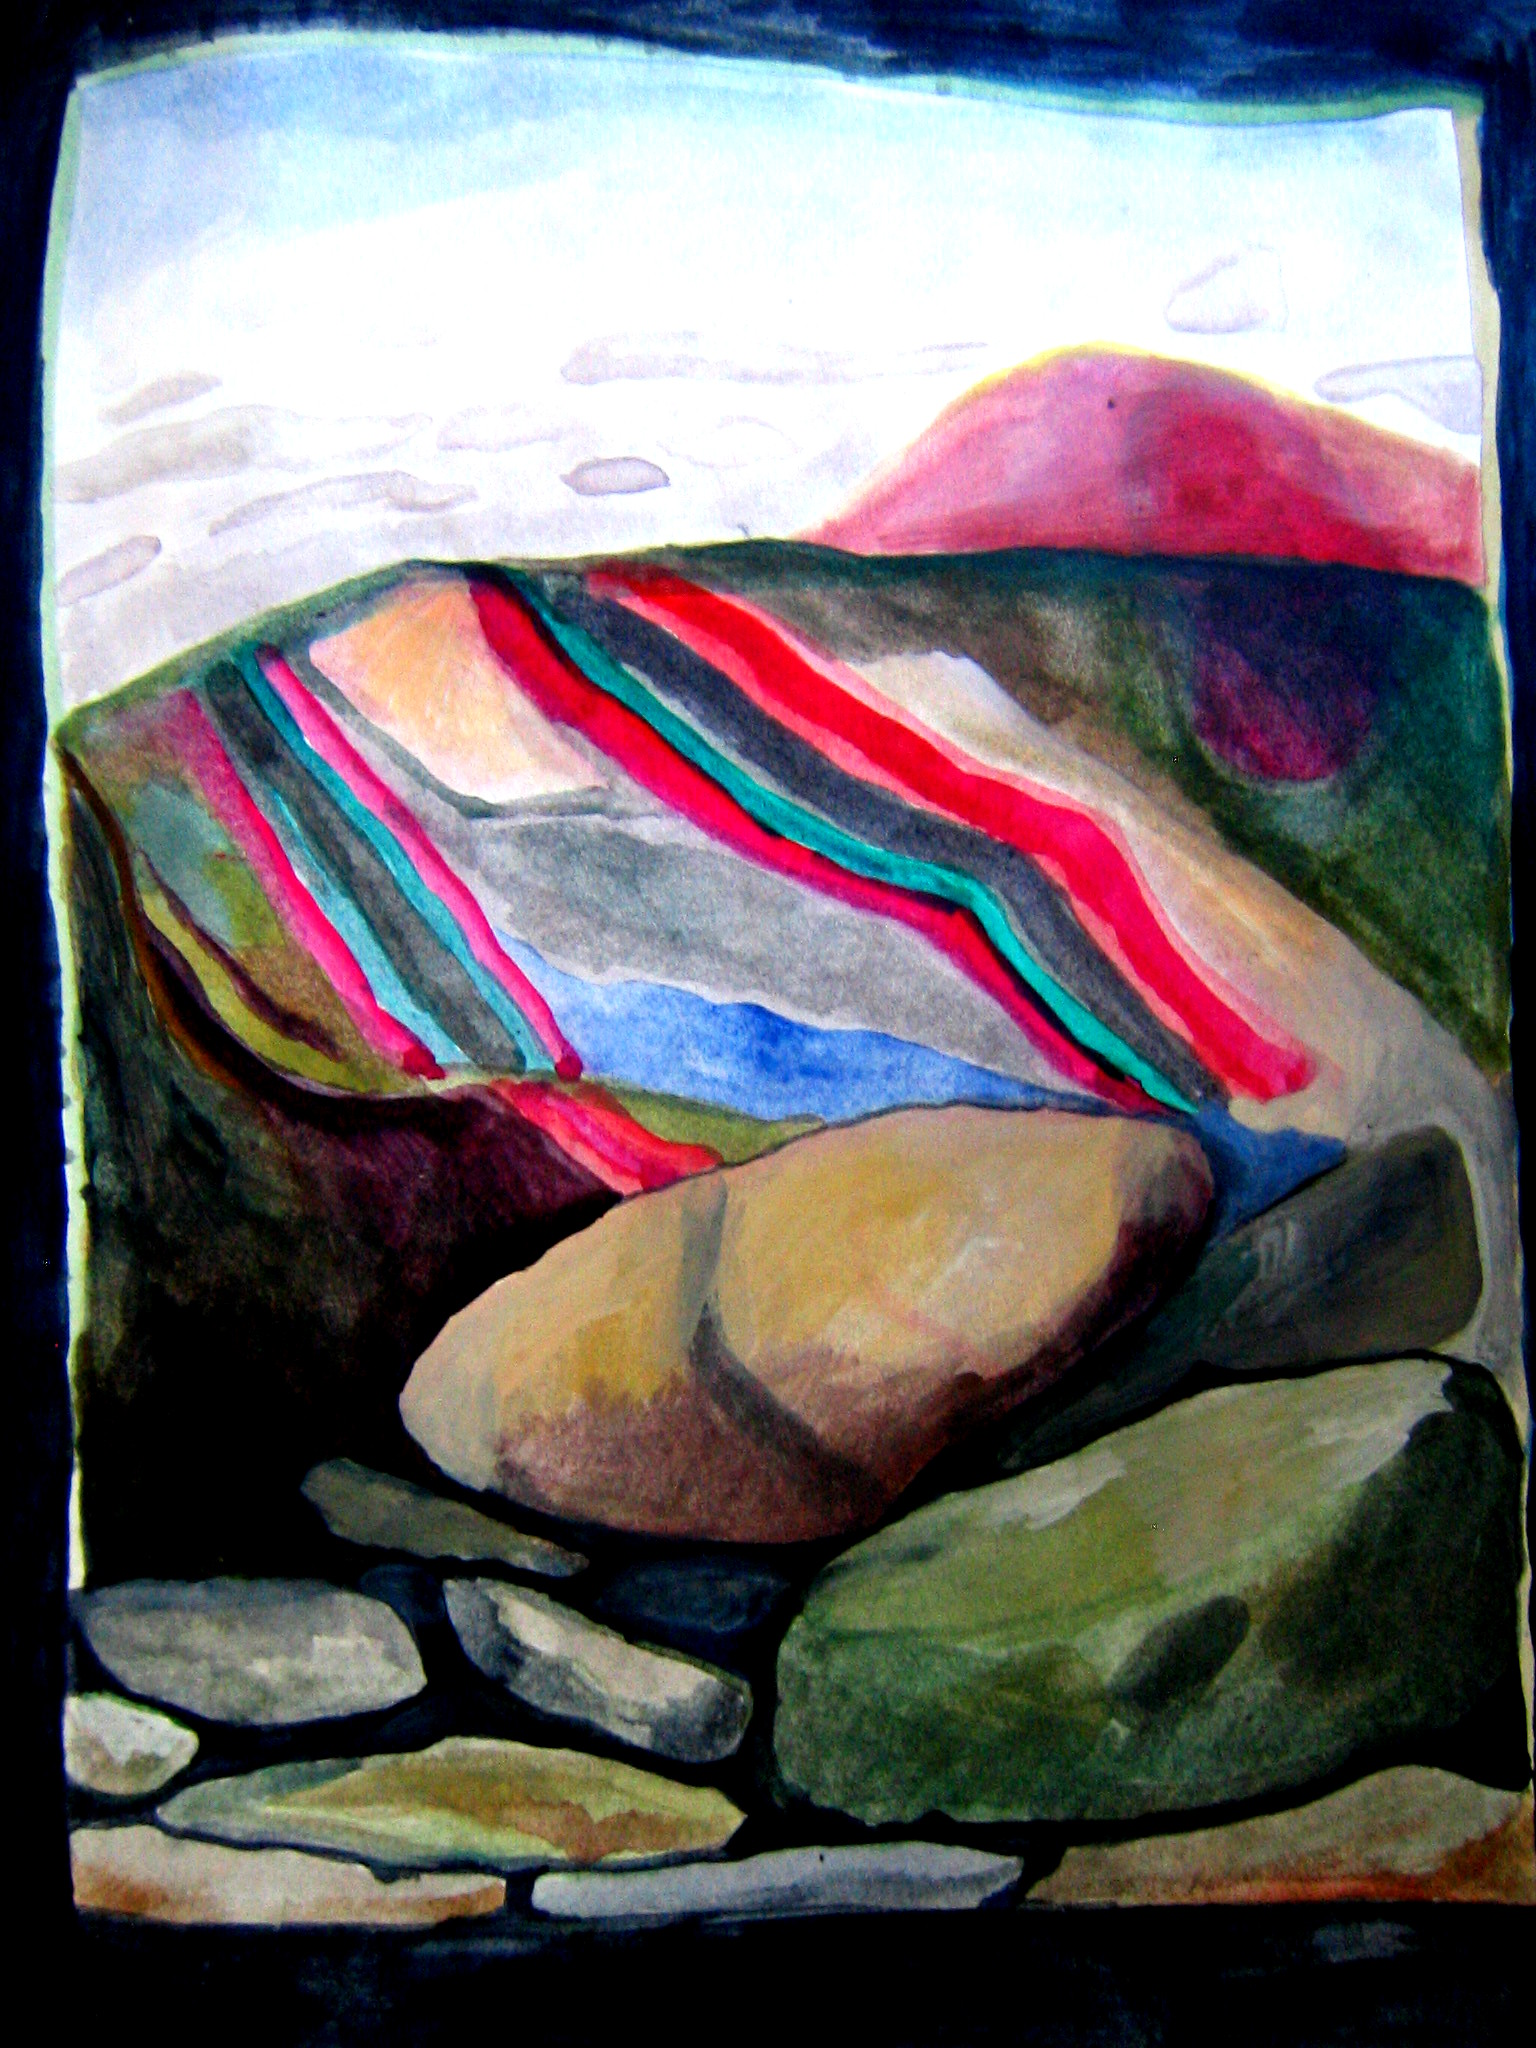 rocks_fabric.JPG